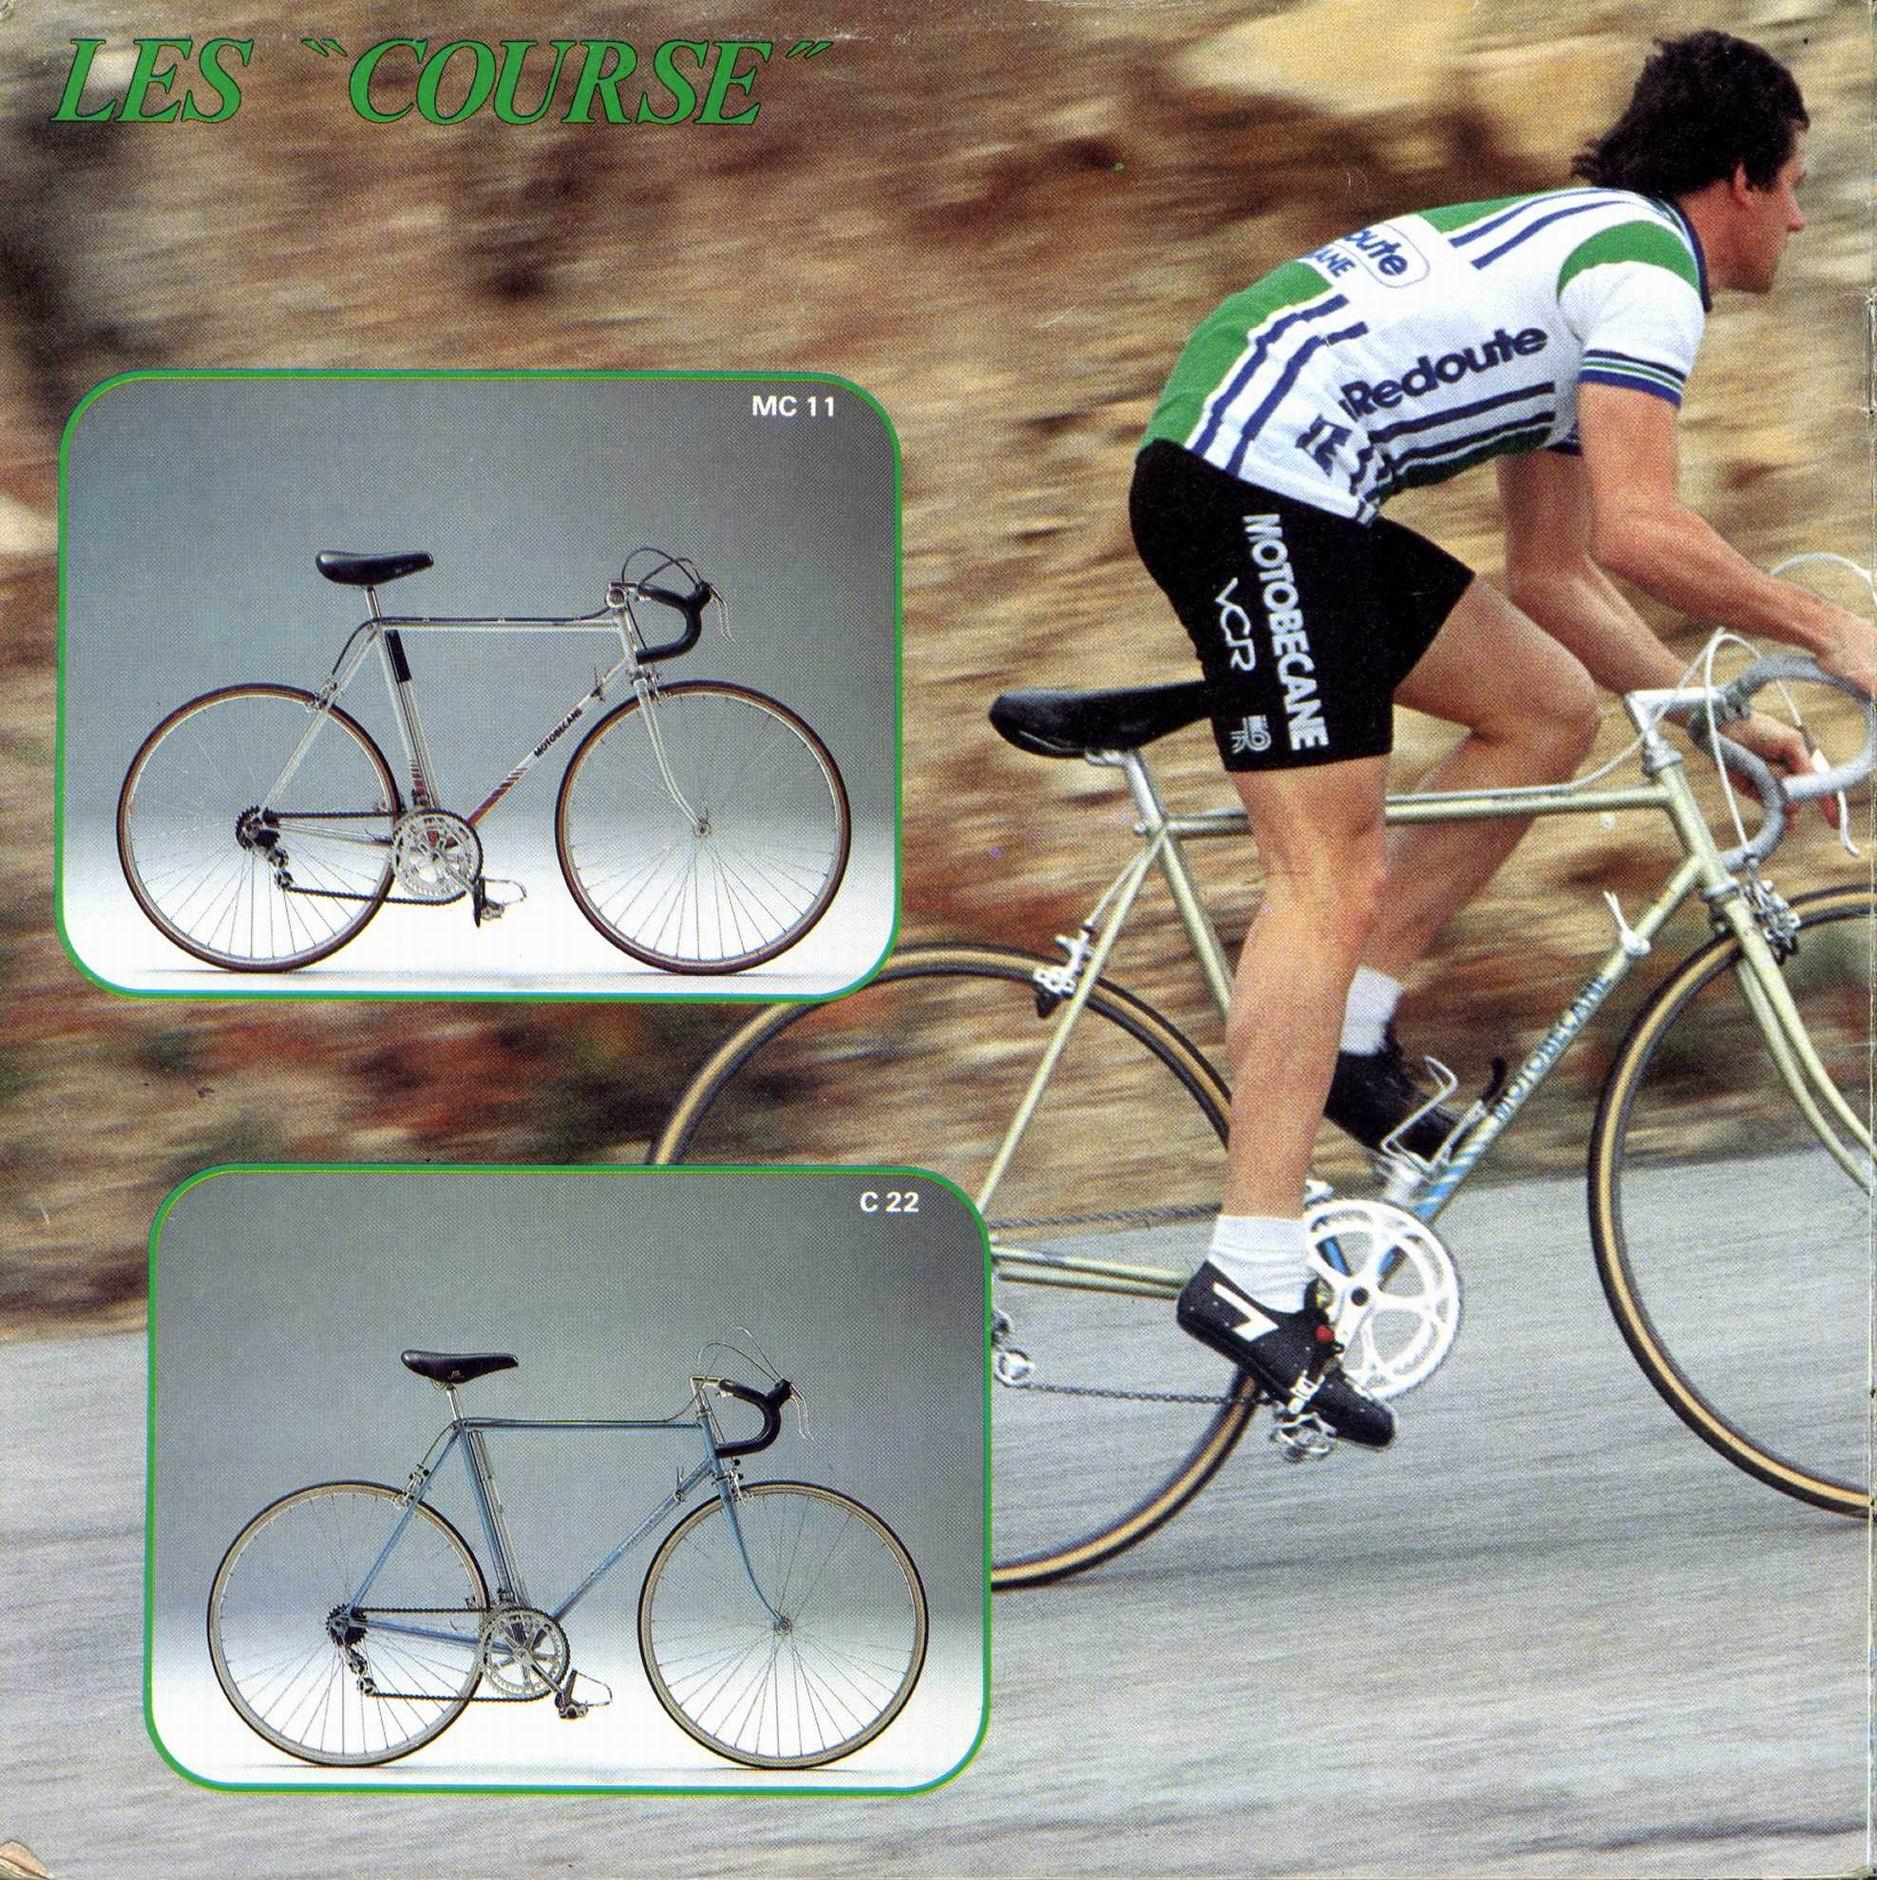 Vélo route Motobécane, mais lequel ? File